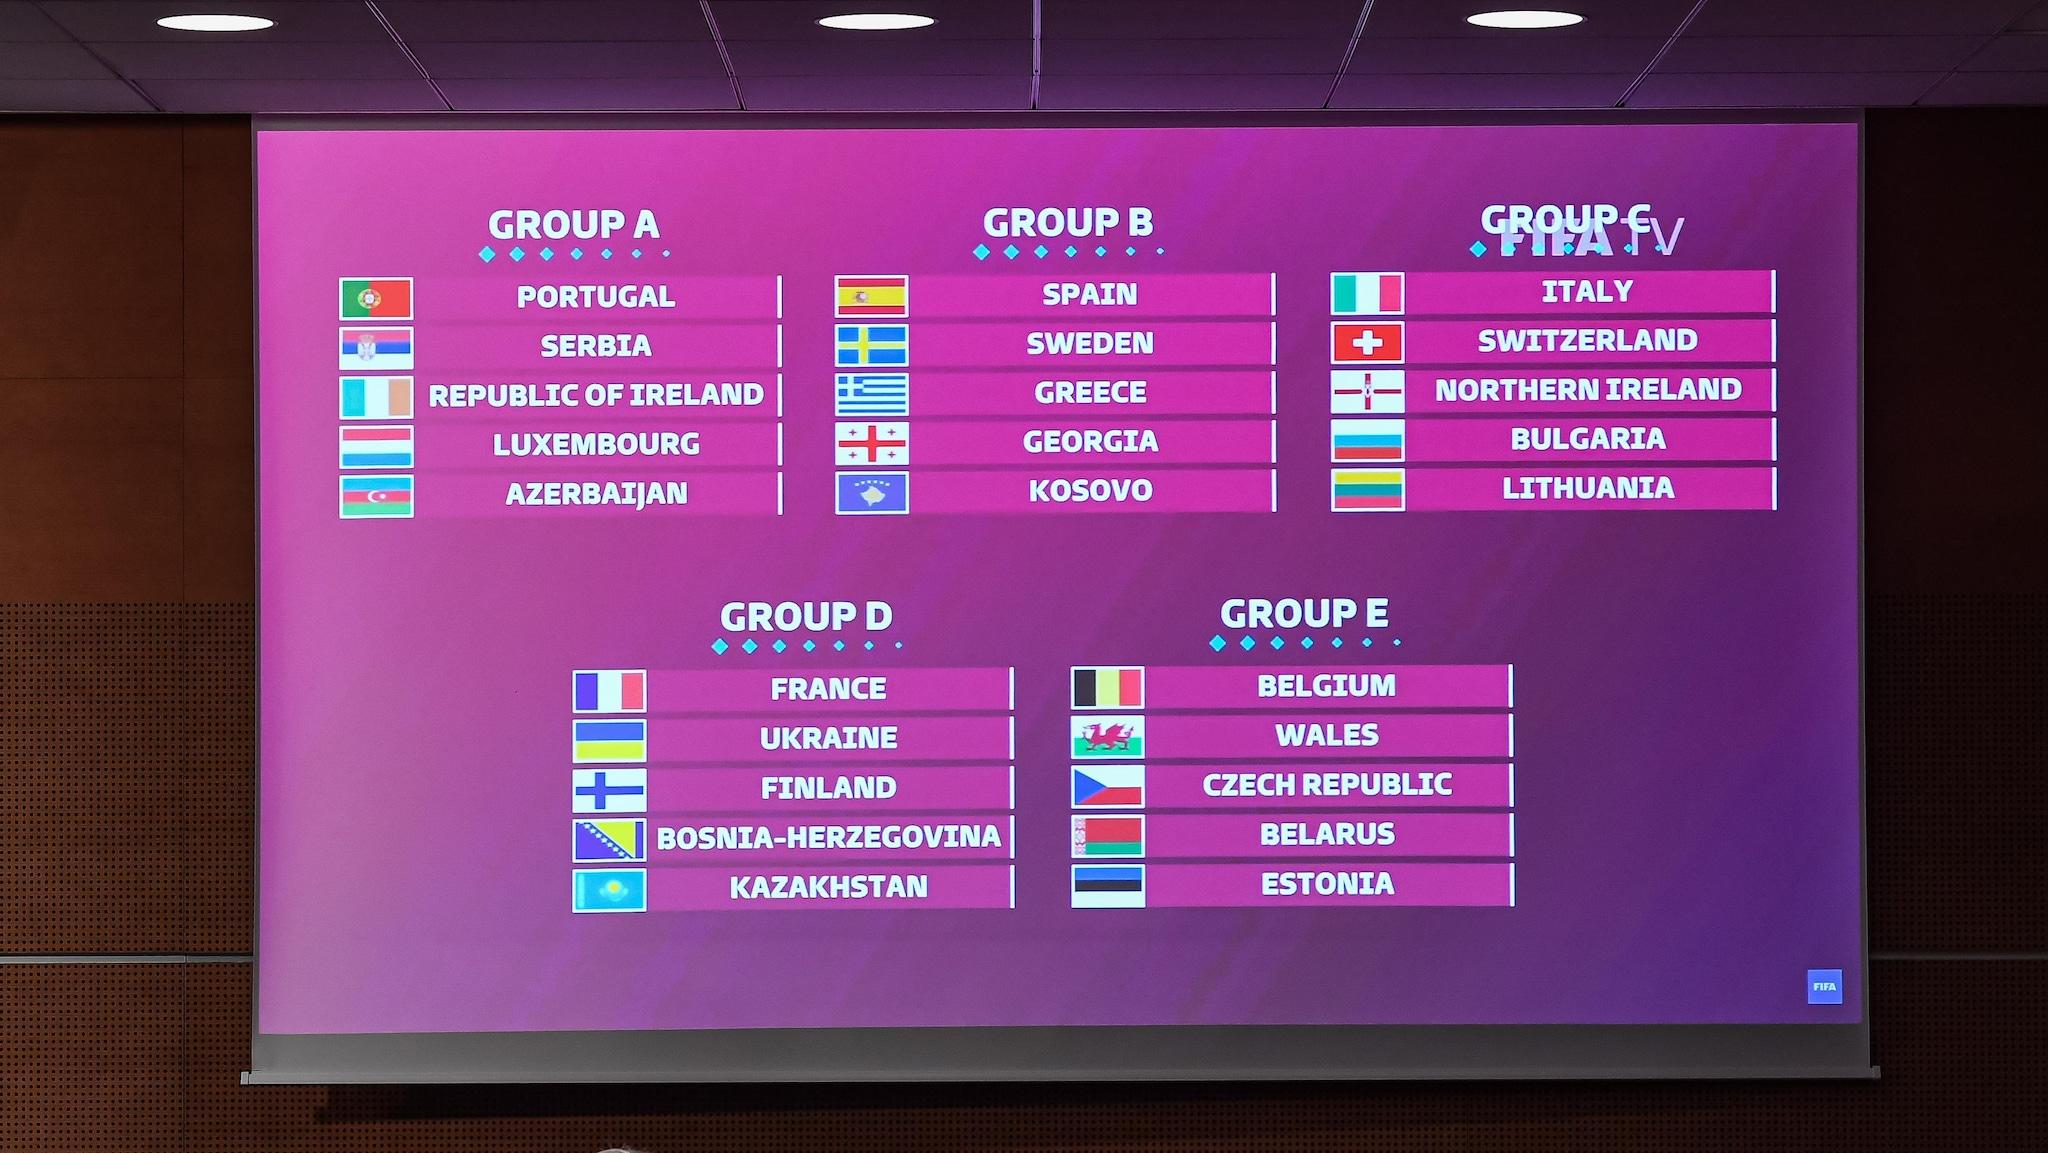 2022 World Cup qualifying draw: France vs Ukraine, England vs Poland